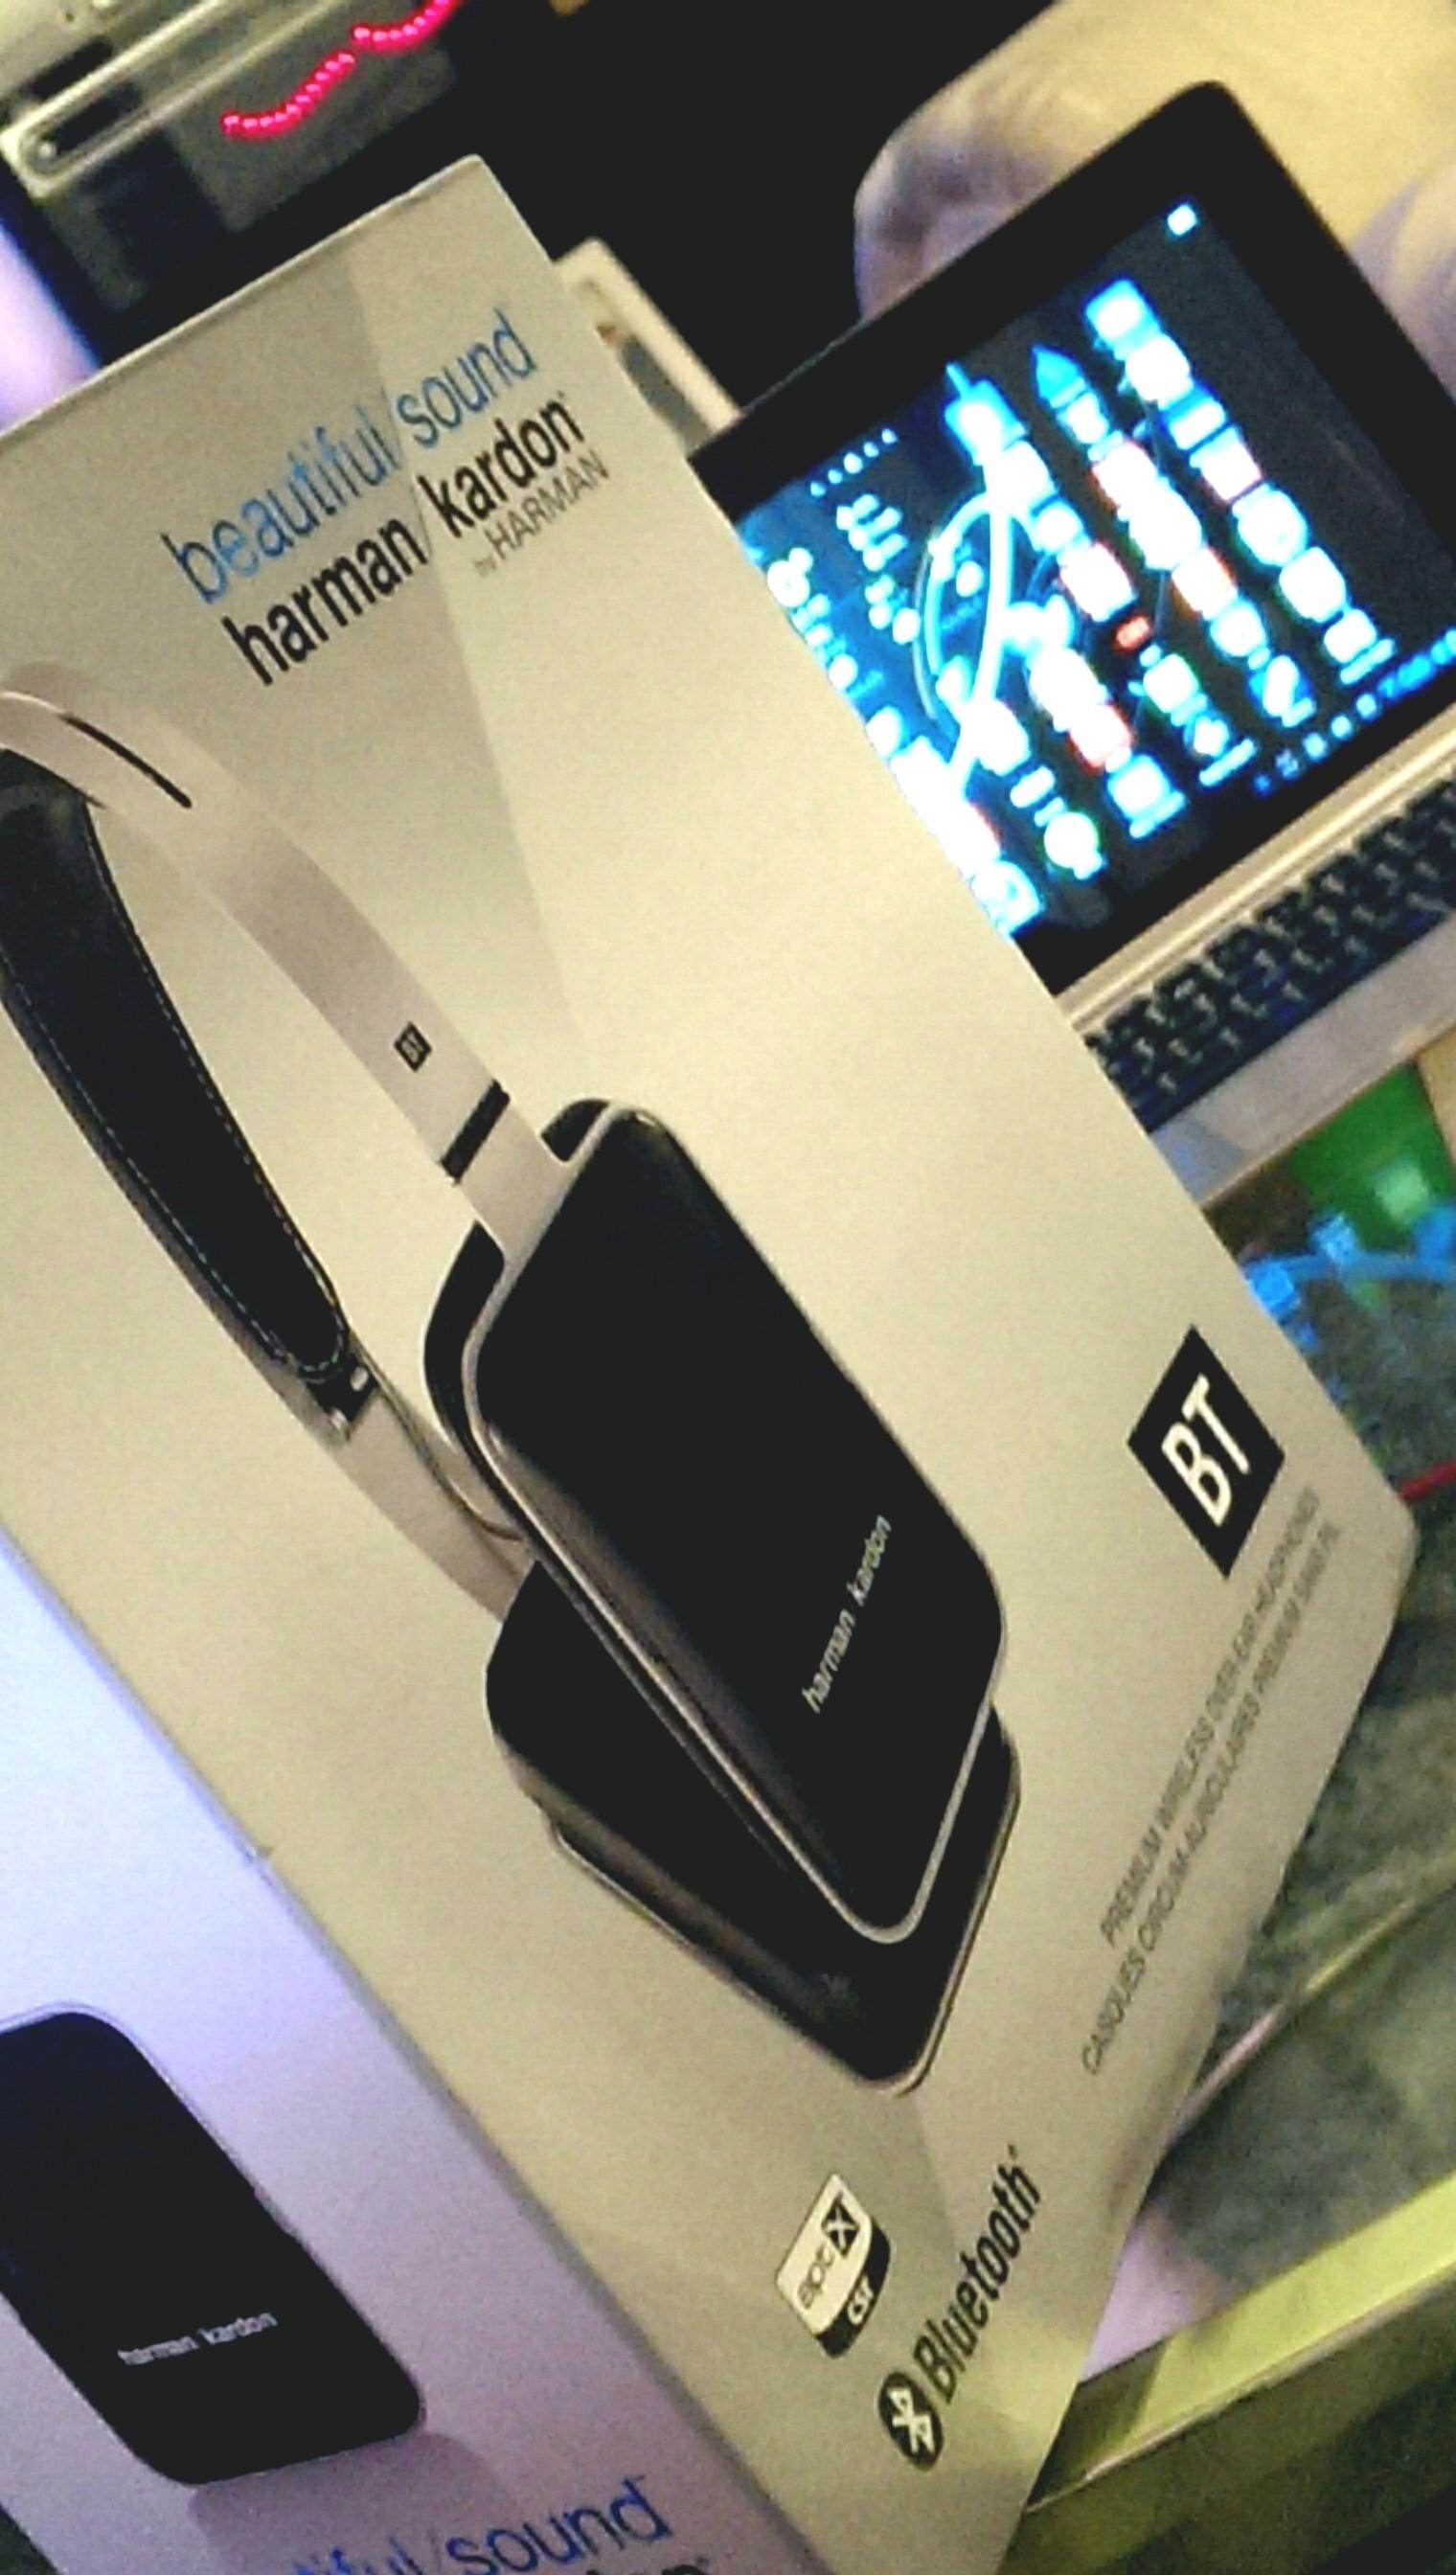 Harman Kardon BT Bluetooth Headphones on deck.... Unboxing video coming up...